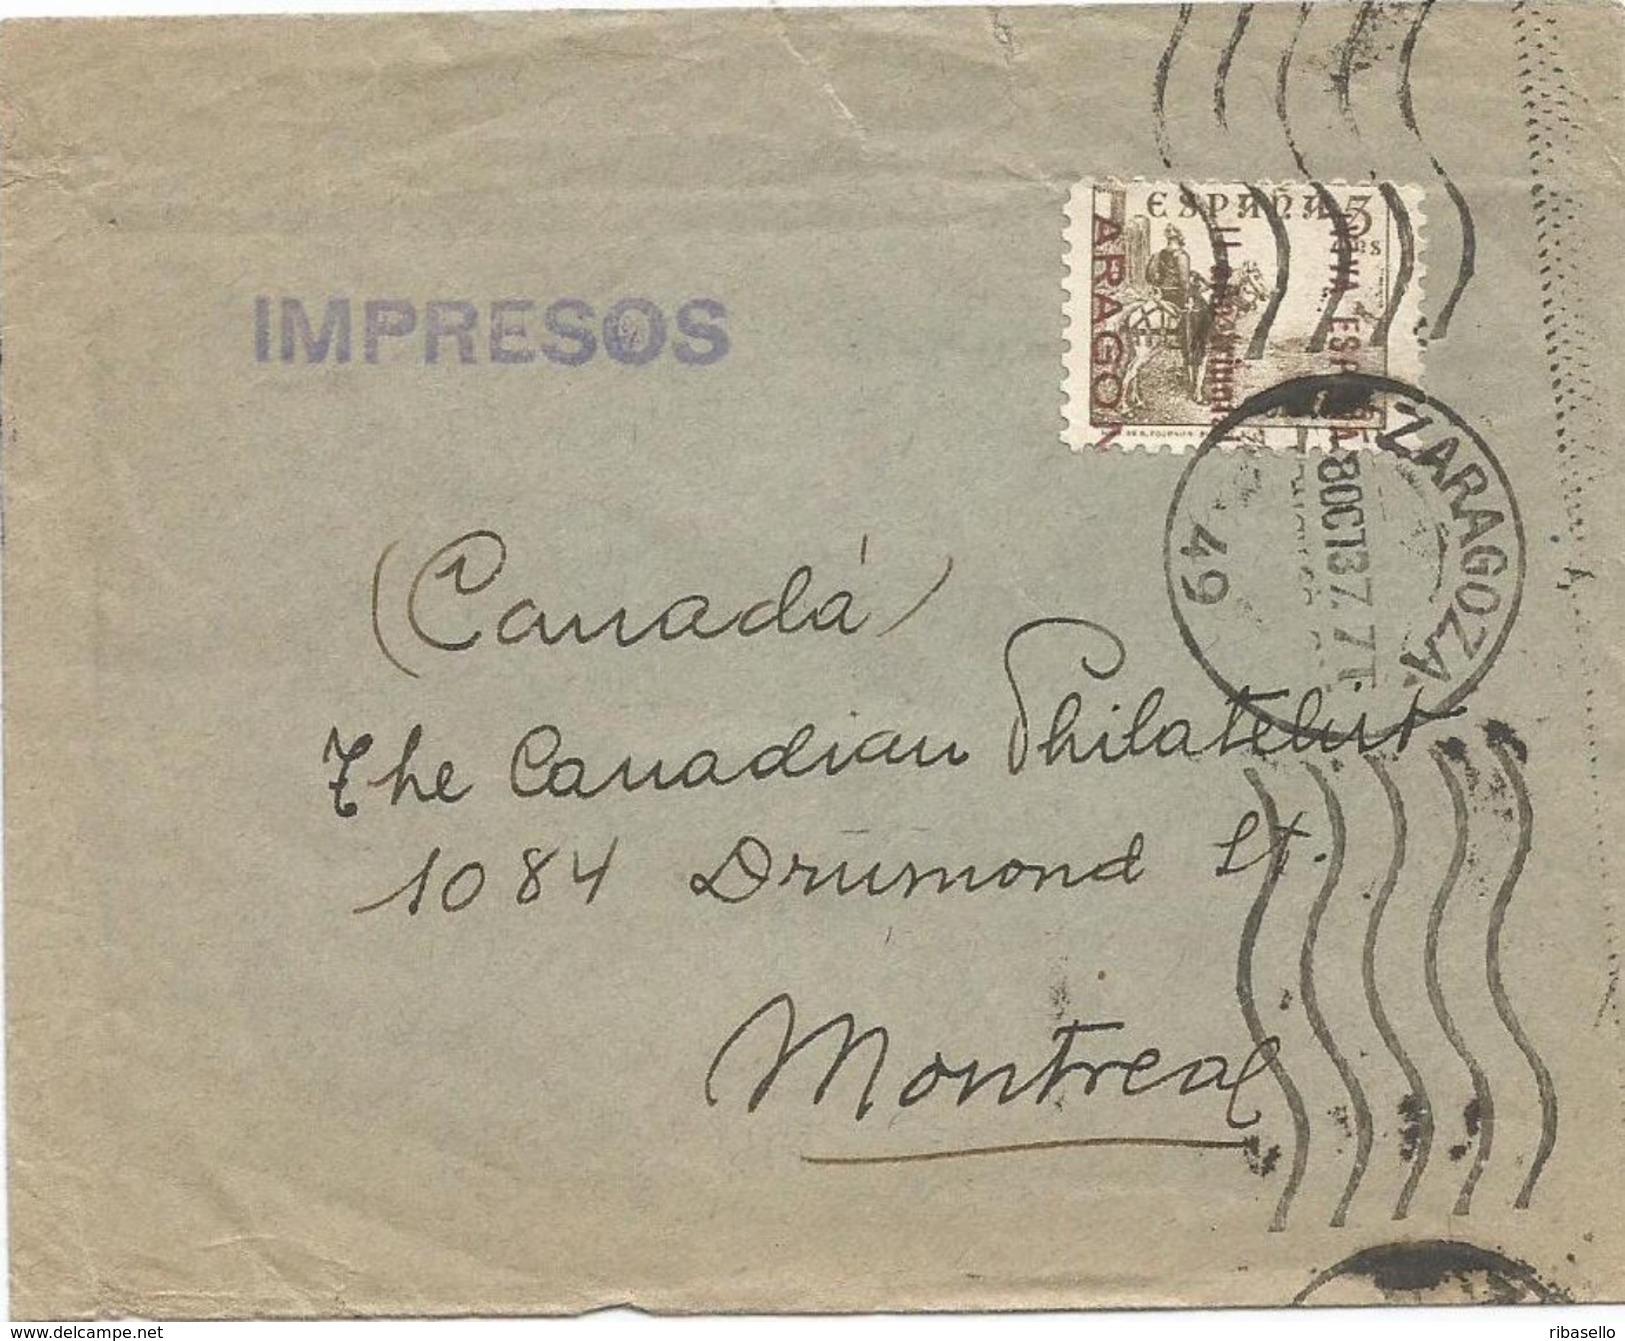 España 1937. Carta De Zaragoza A Montreal. Patriotico. Censura. - Marcas De Censura Nacional